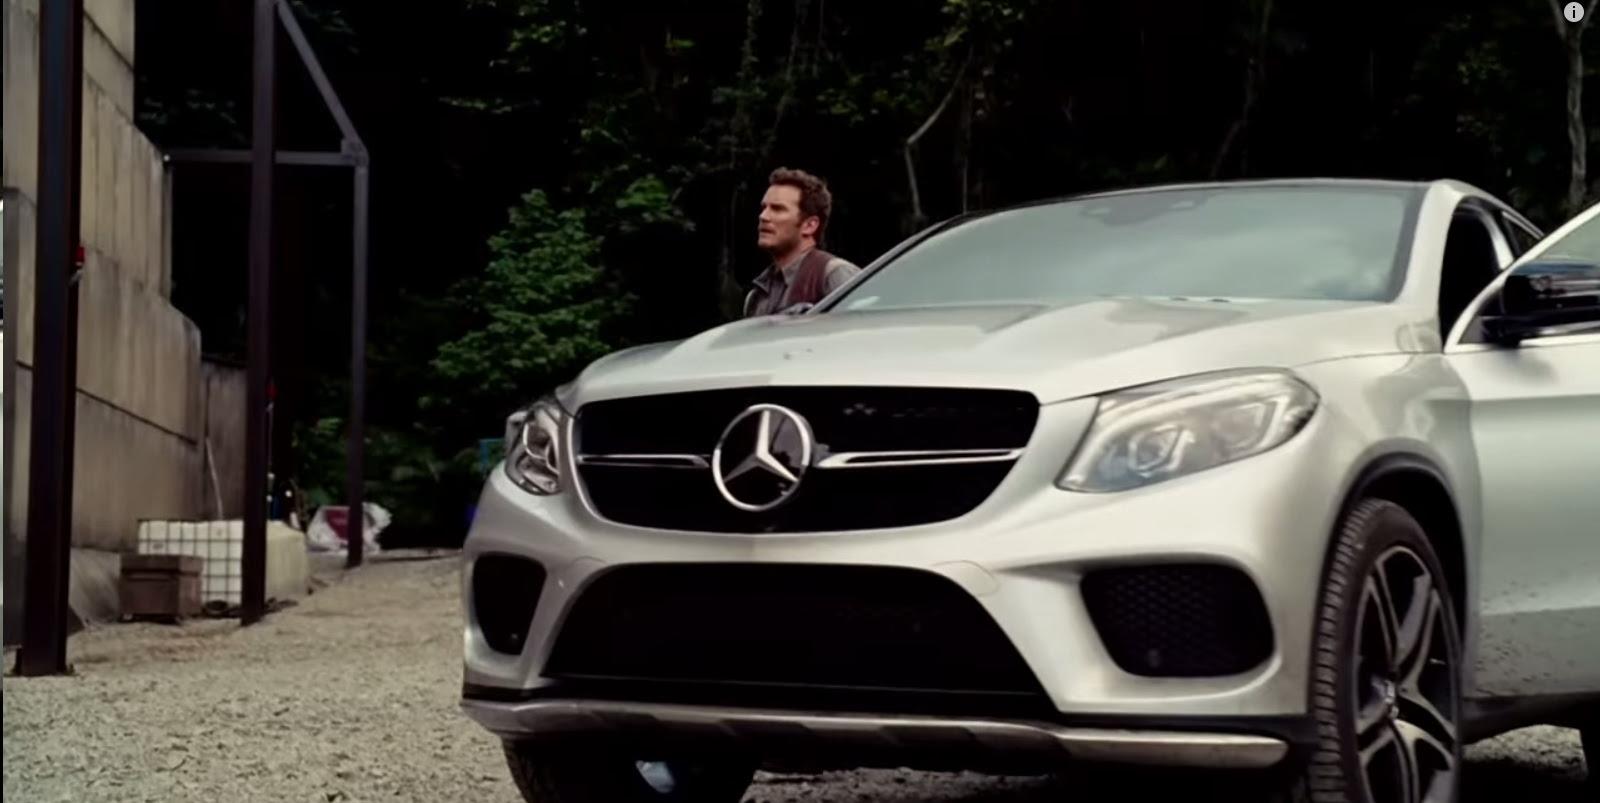 Mercedes-Benz GLE 450 AMG Coupé - Jurassic World (2015) Movie